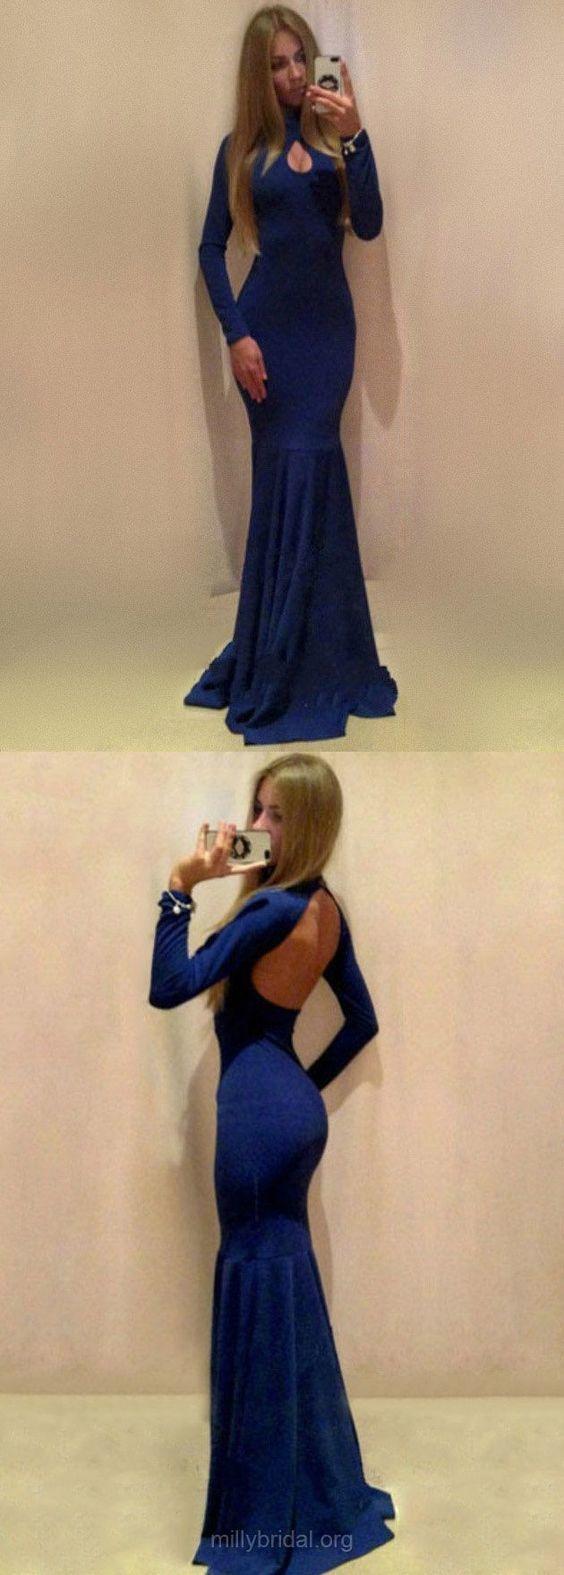 Blue Prom Dresses, Long Prom Dresses, Long Sleeve Prom Dresses For Teens